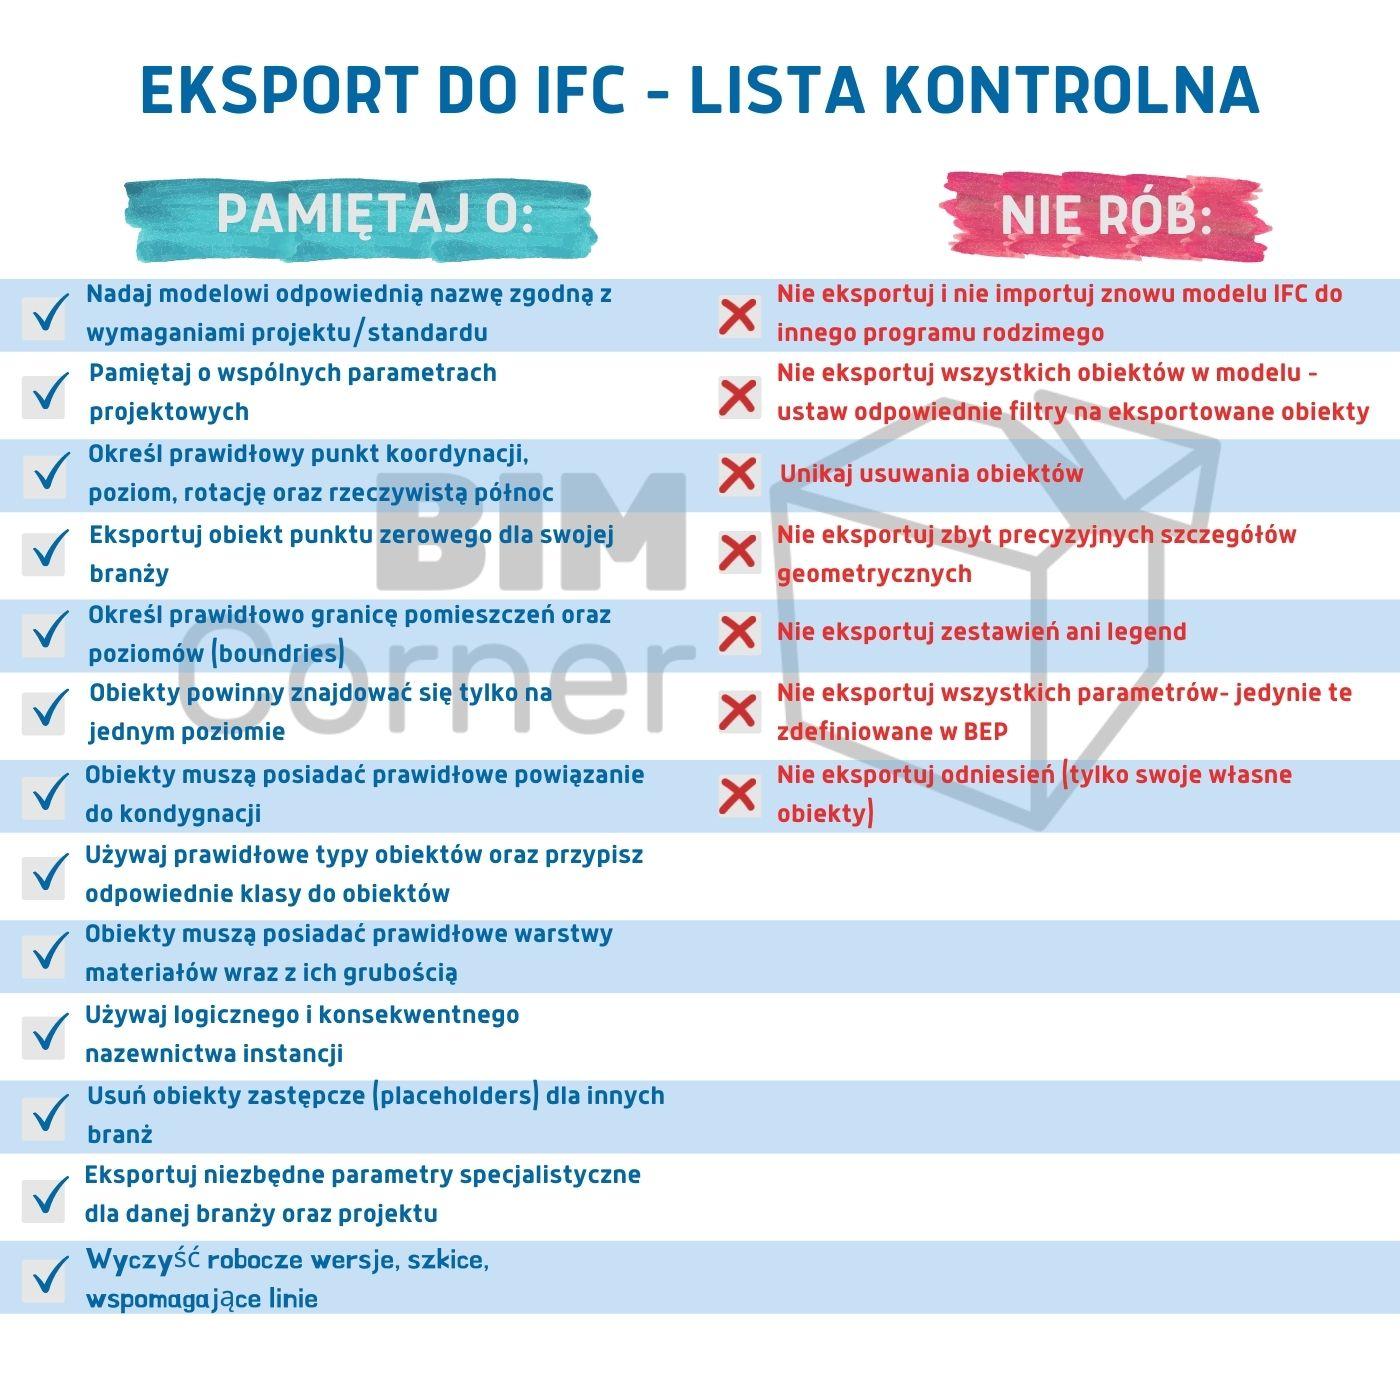 eksport do ifc lista kontrolna